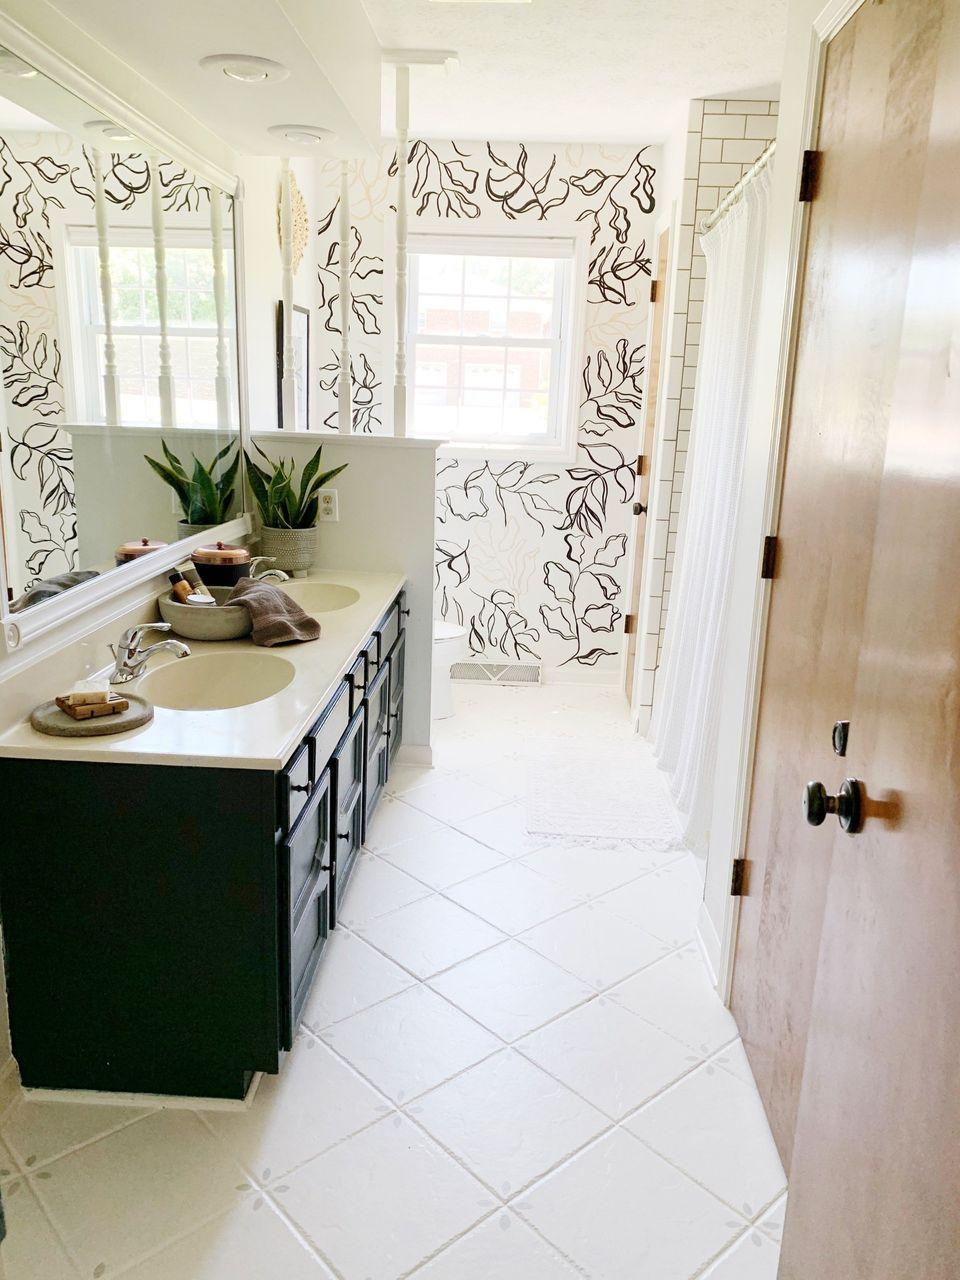 Rust Oleum Home Floor Coating for Painting Tile Floors